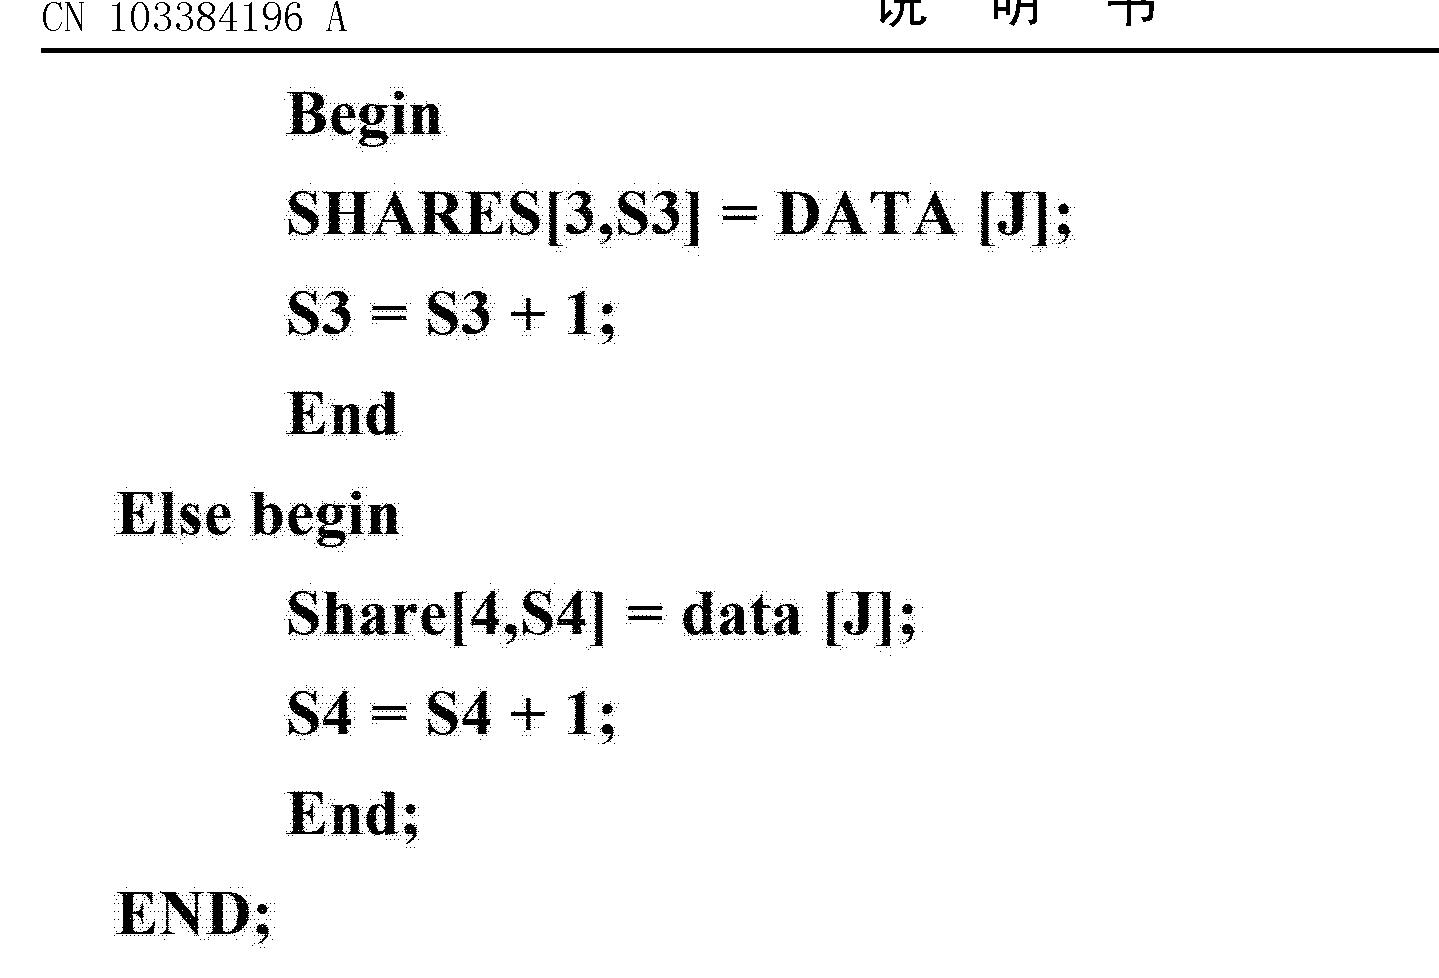 Figure CN103384196AD00441